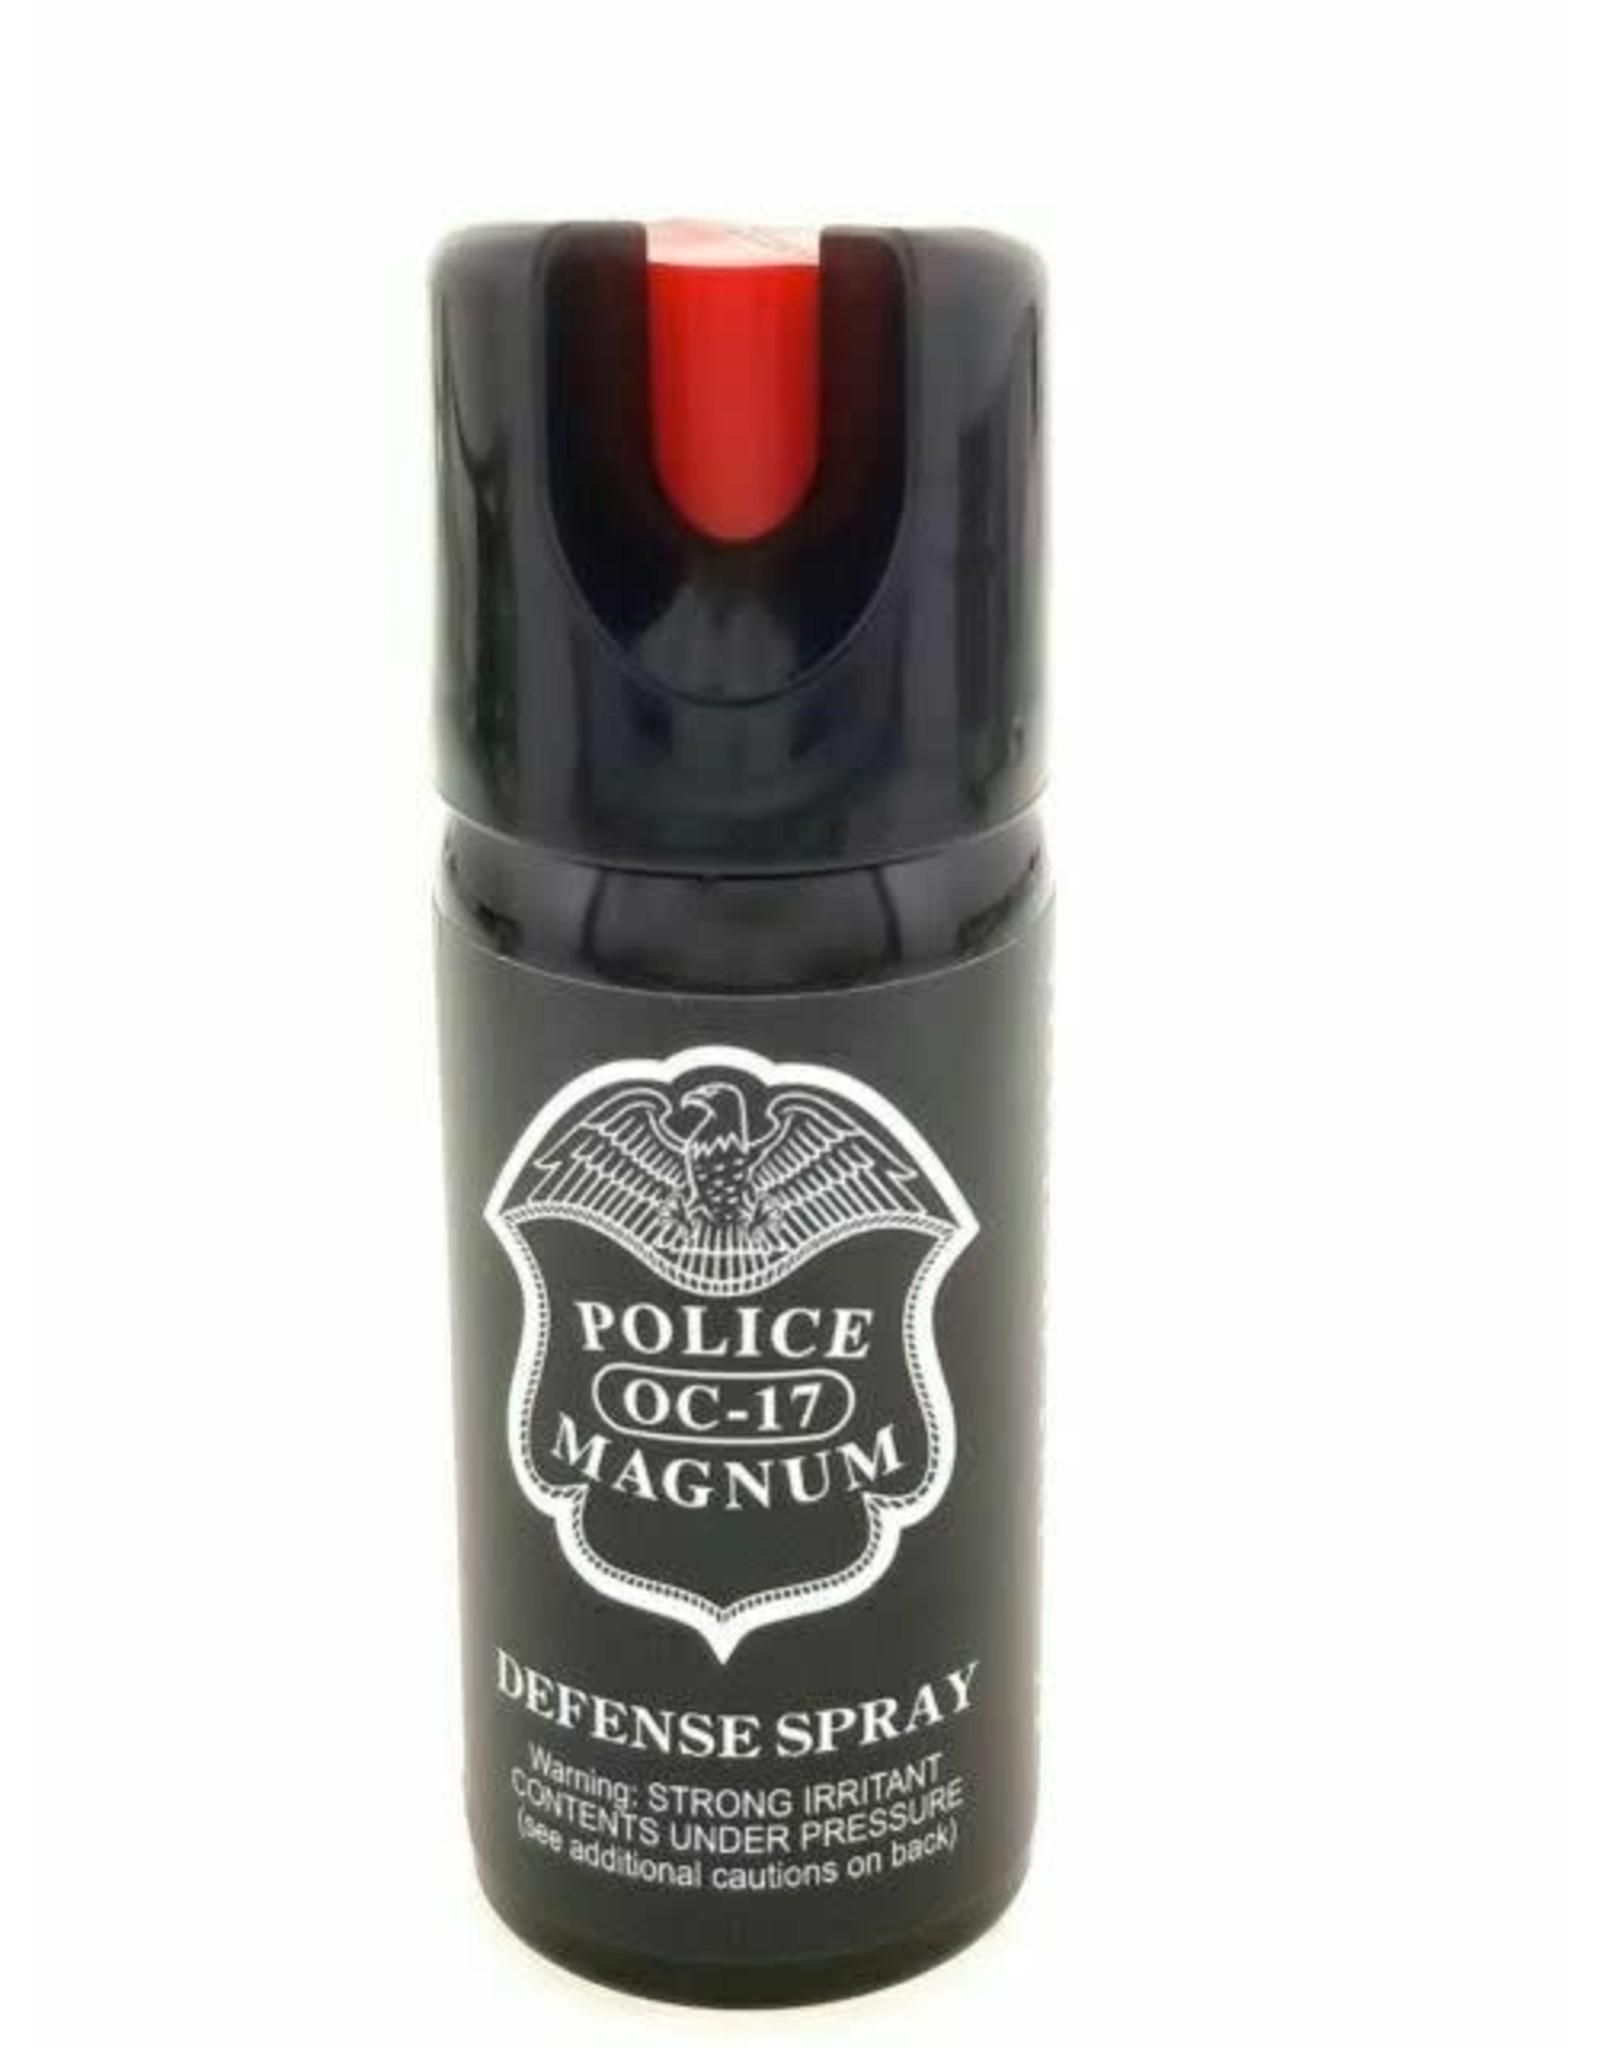 Police Magnum (OC-17) 2 OZ Defense Spray